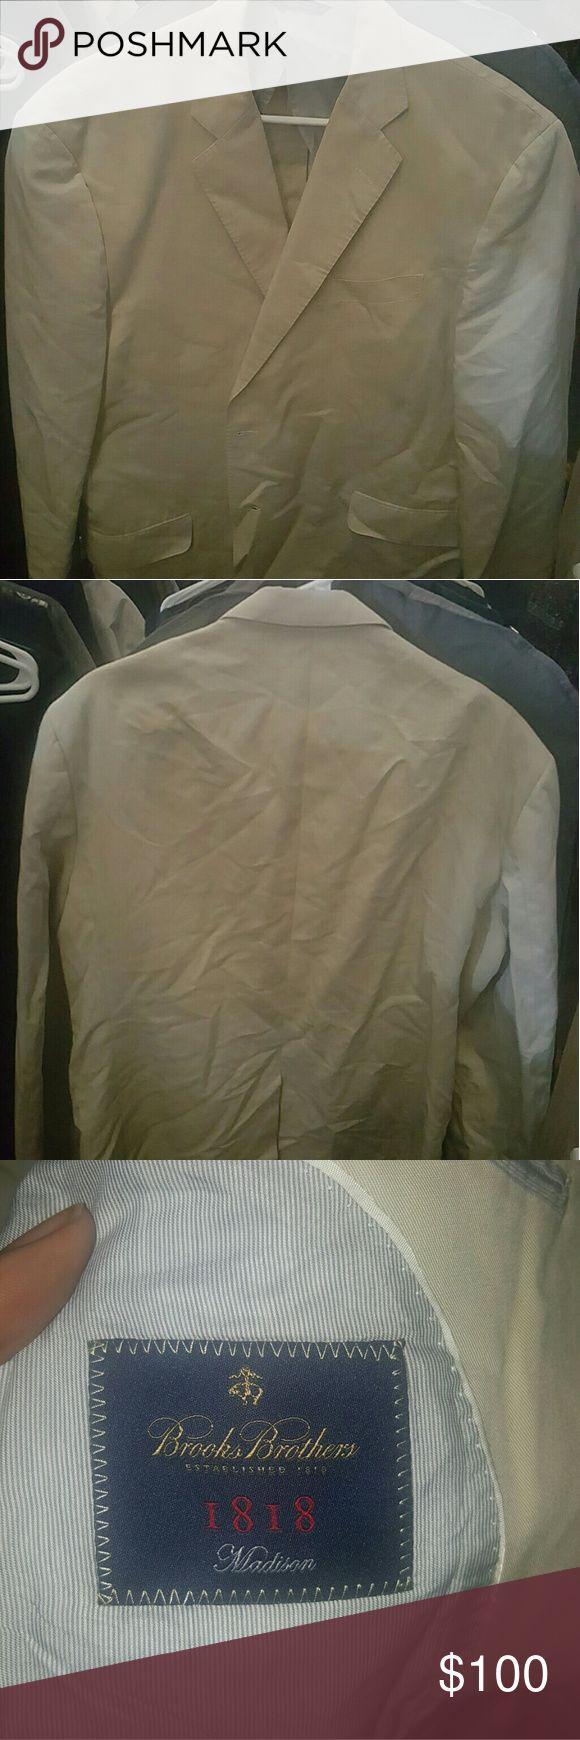 Brooks brothers blazer Too small for me Brooks Brothers Suits & Blazers Sport Coats & Blazers